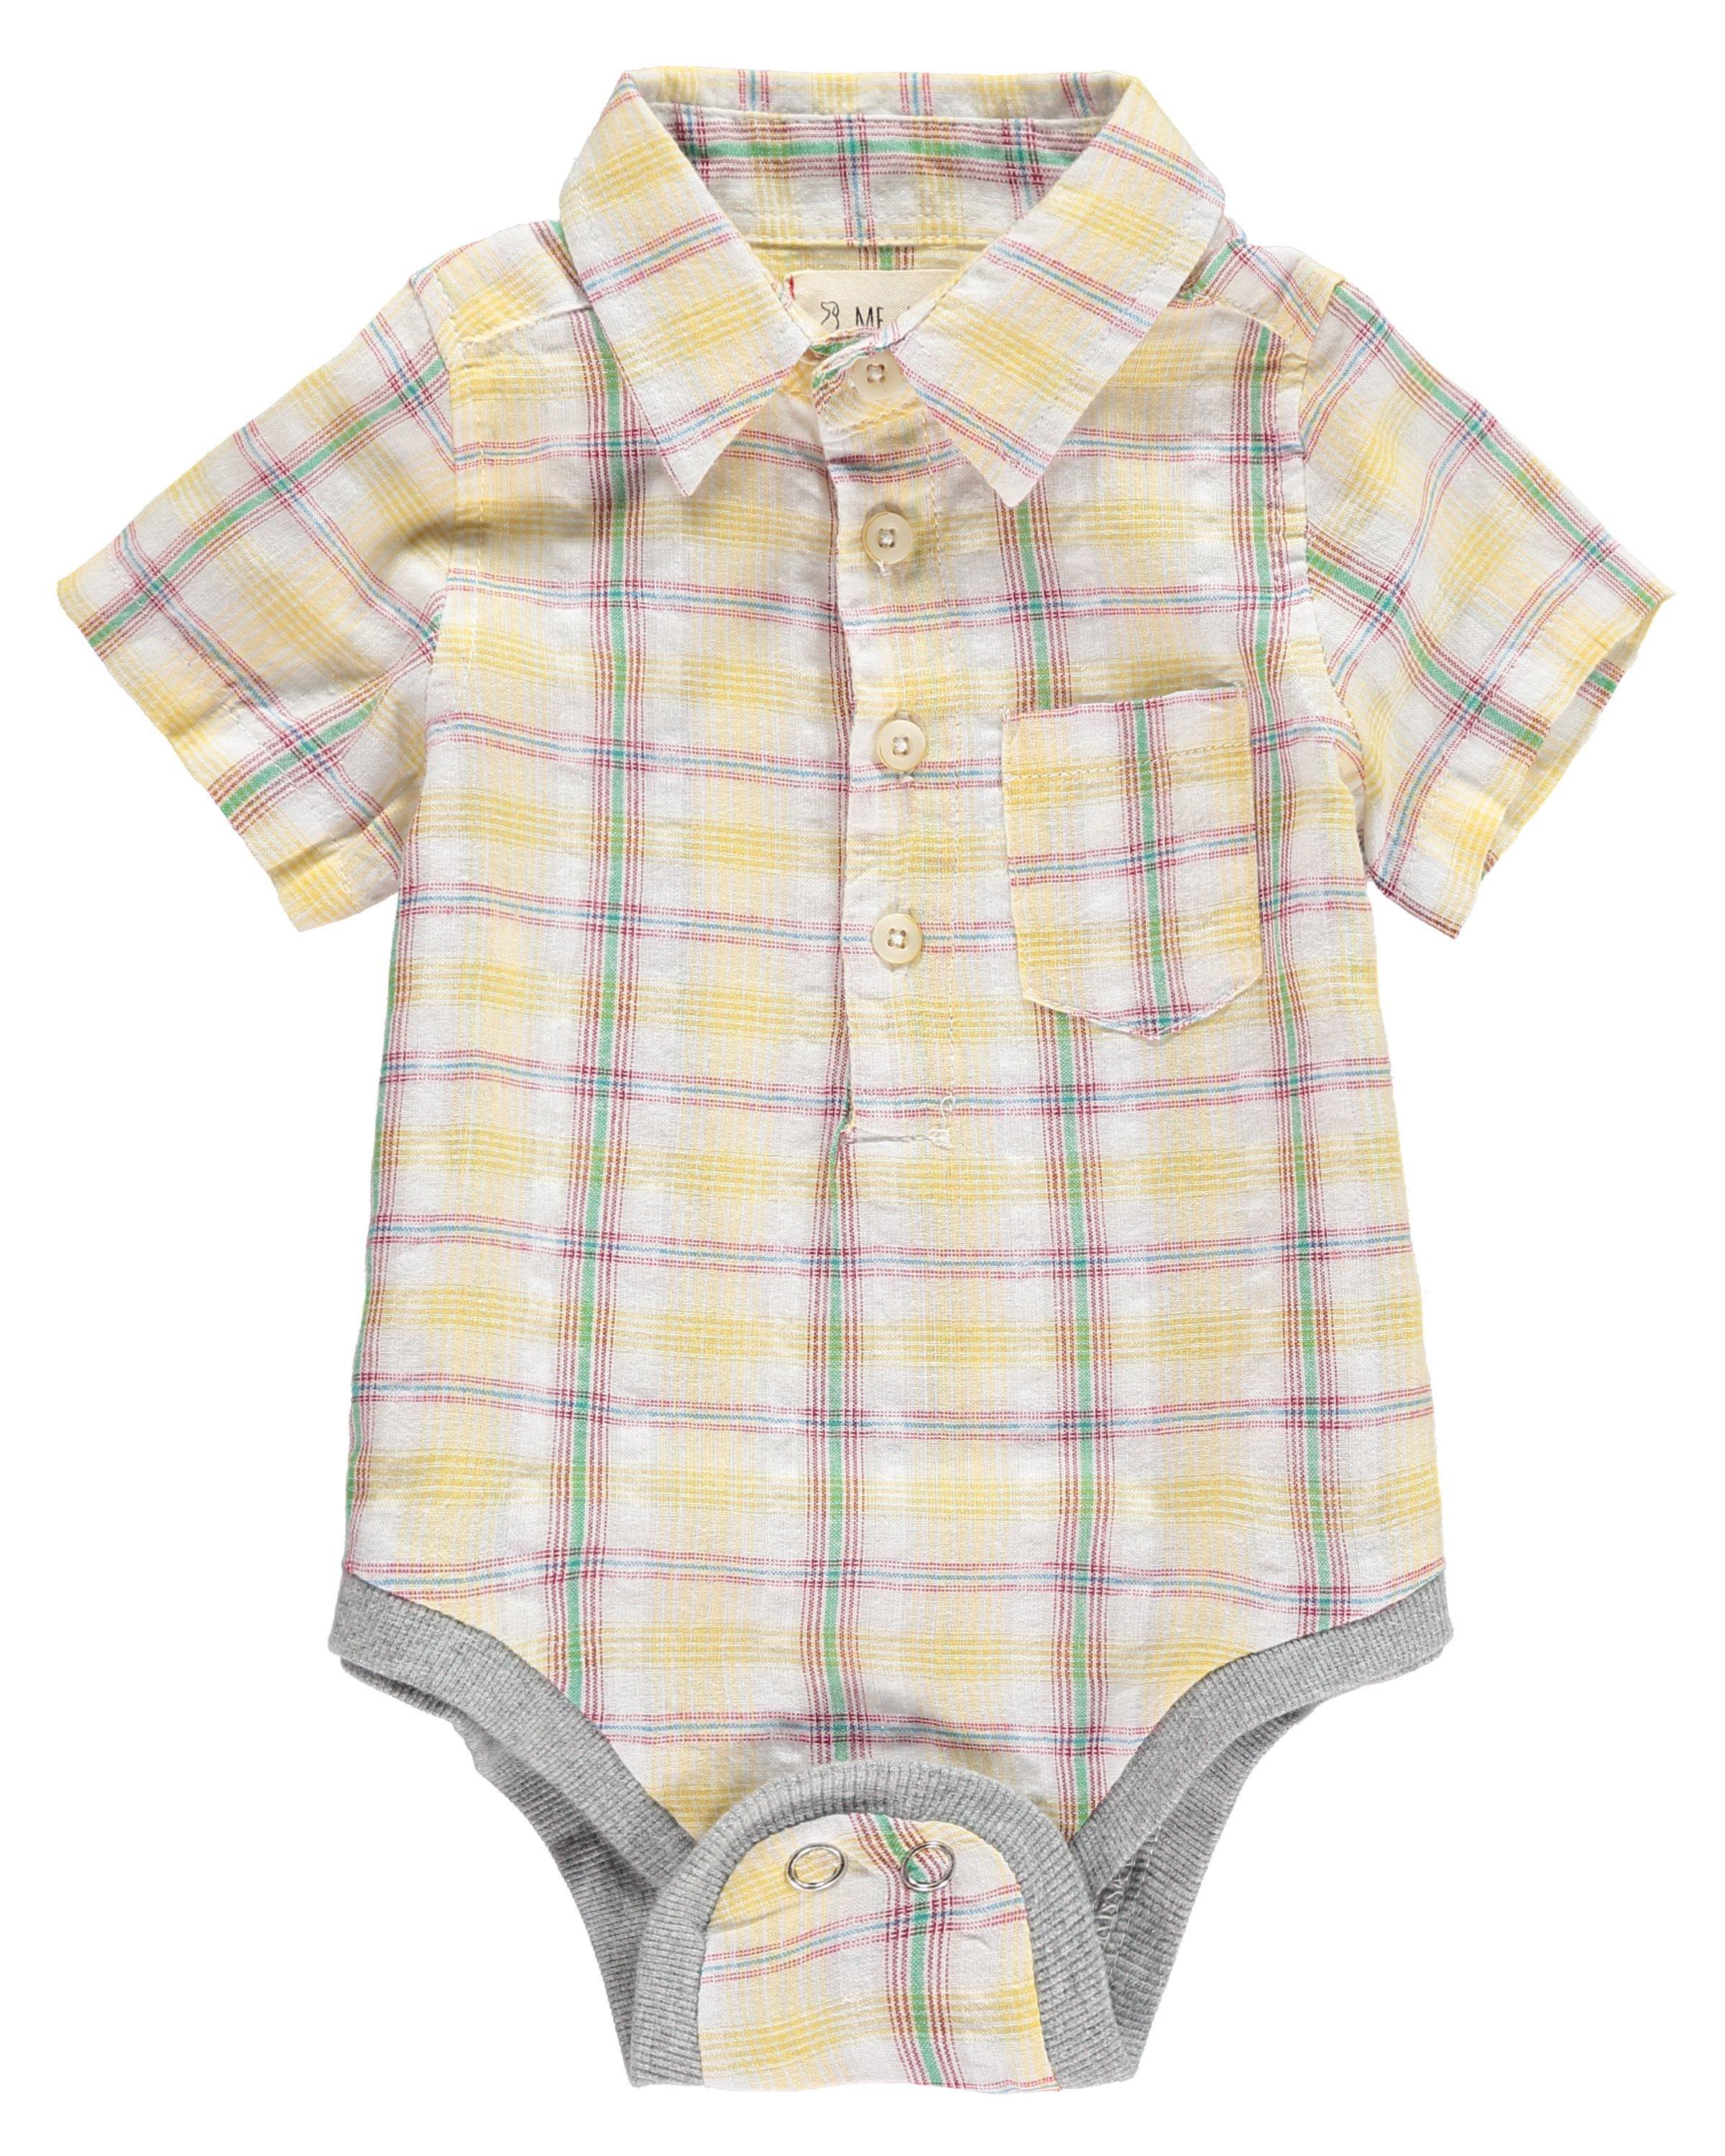 Me+Henry Short Sleeve Button Up Onesie | Designer baby ...